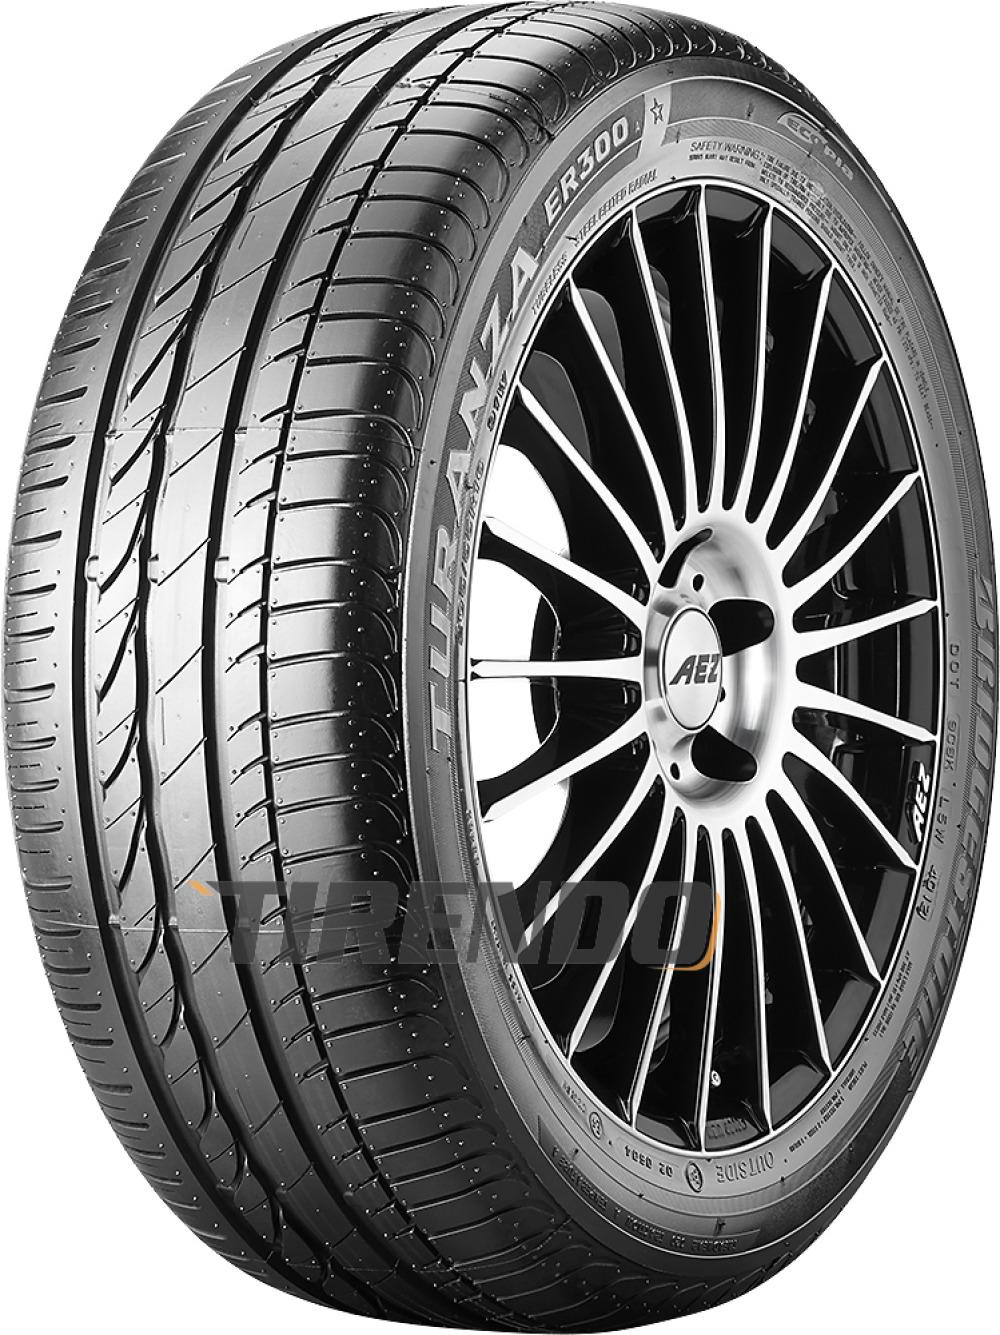 Bridgestone Turanza ER 300A Ecopia ( 195/55 R16 87W *, mit Felgenschutz (MFS) )